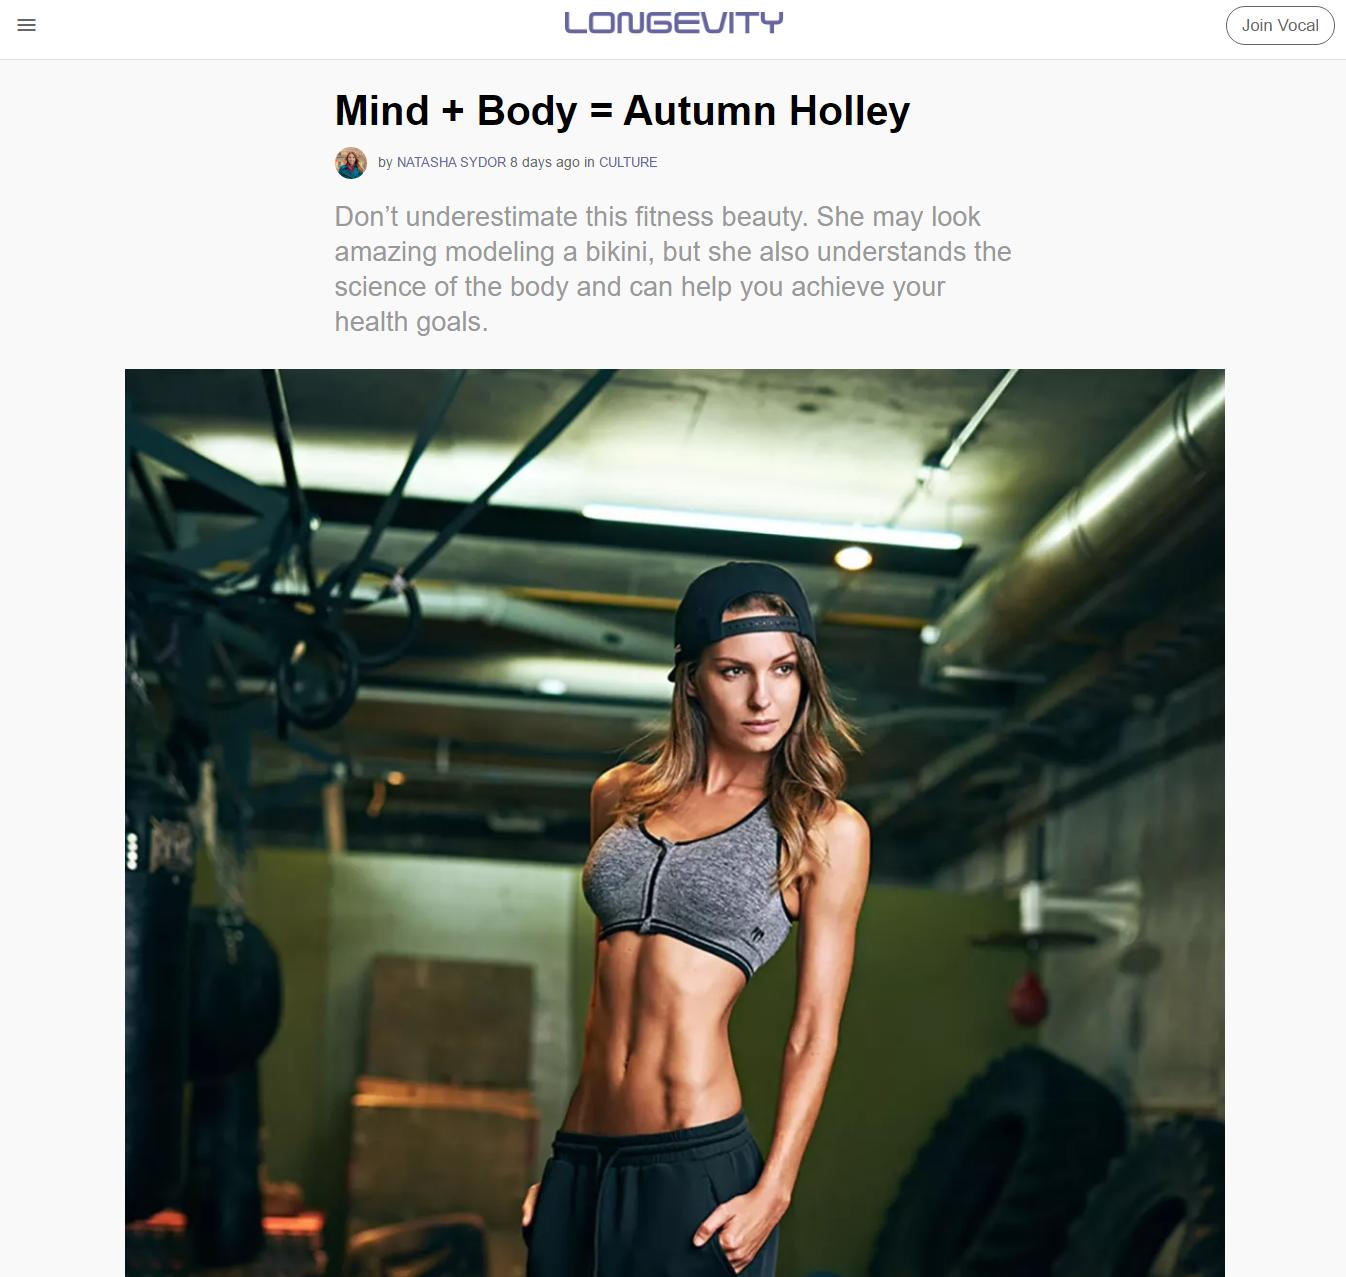 mind-body-autumn-holley-longevity-tn.png